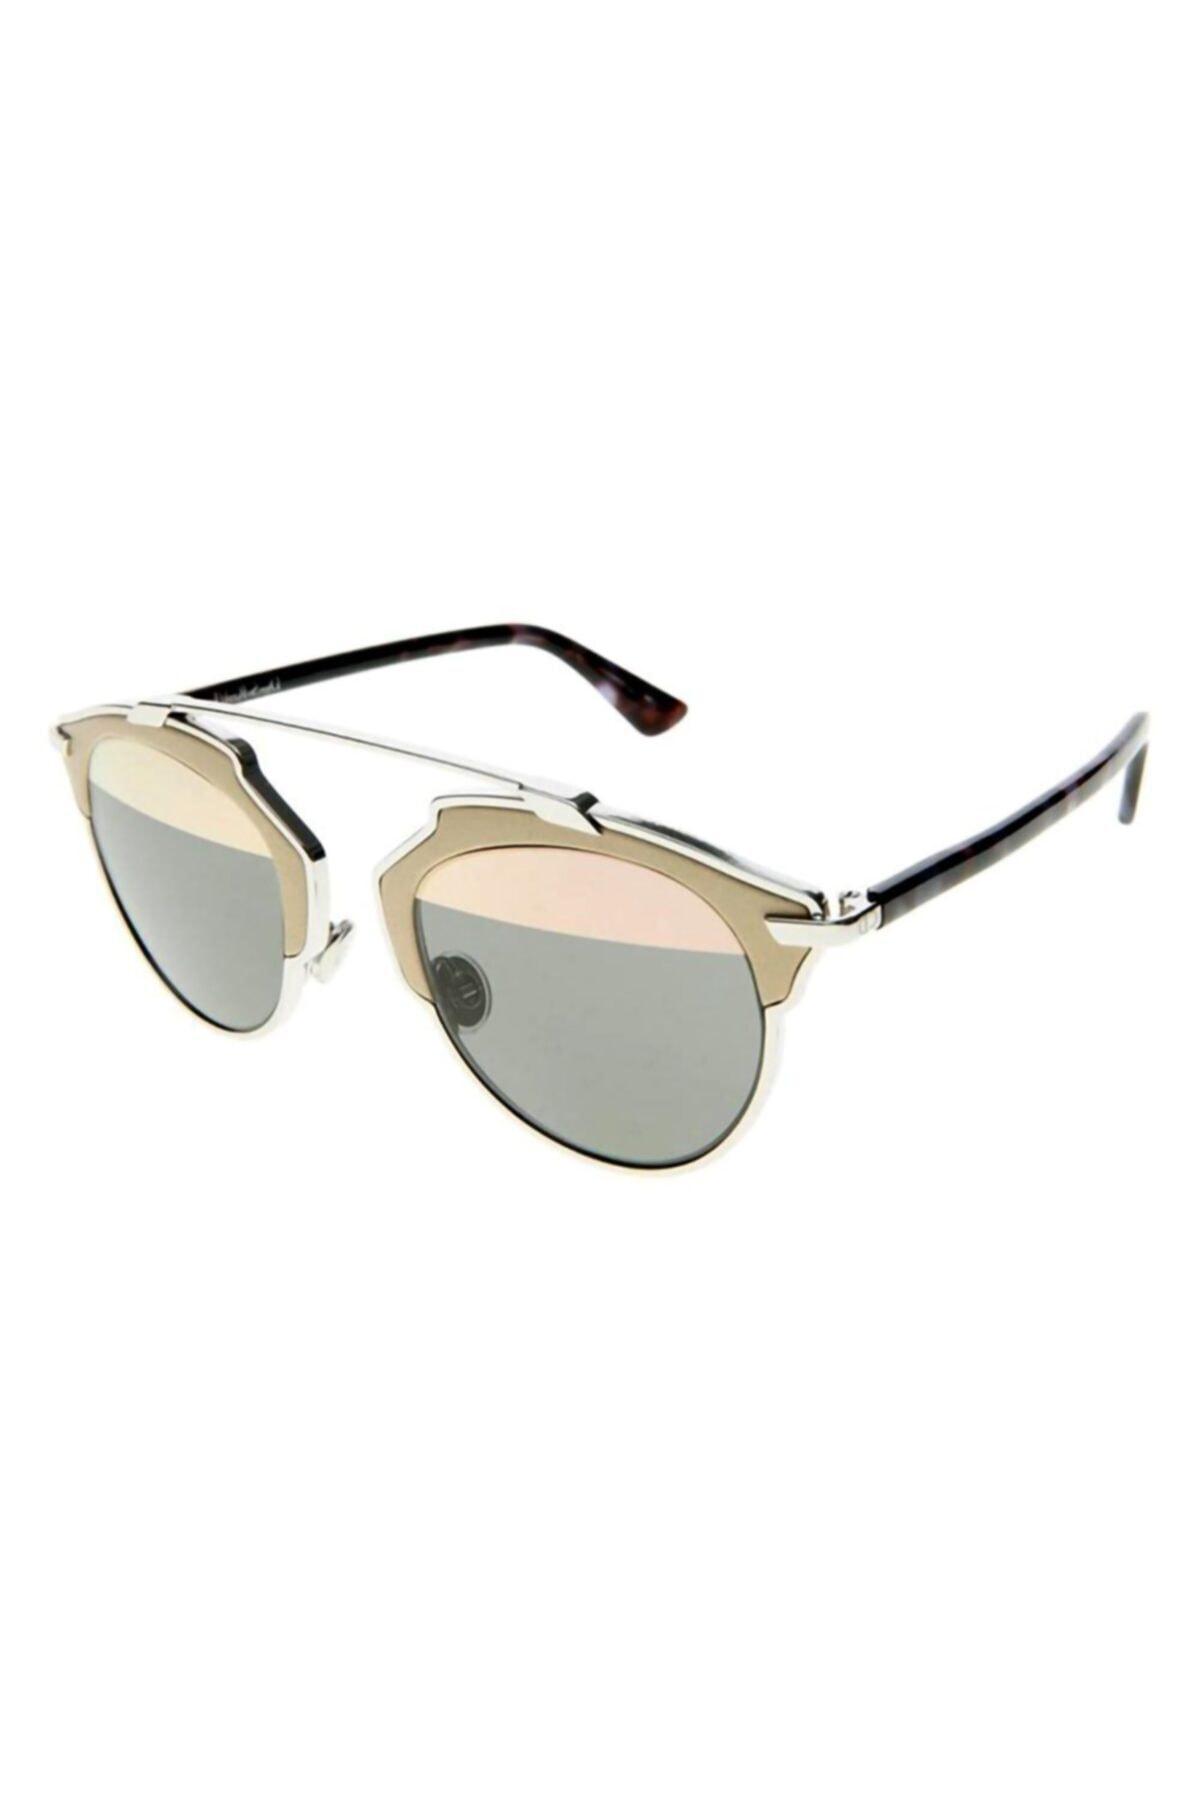 عینک آفتابی زنانه فانتزی برند Christian Dior رنگ مشکی کد ty57330954